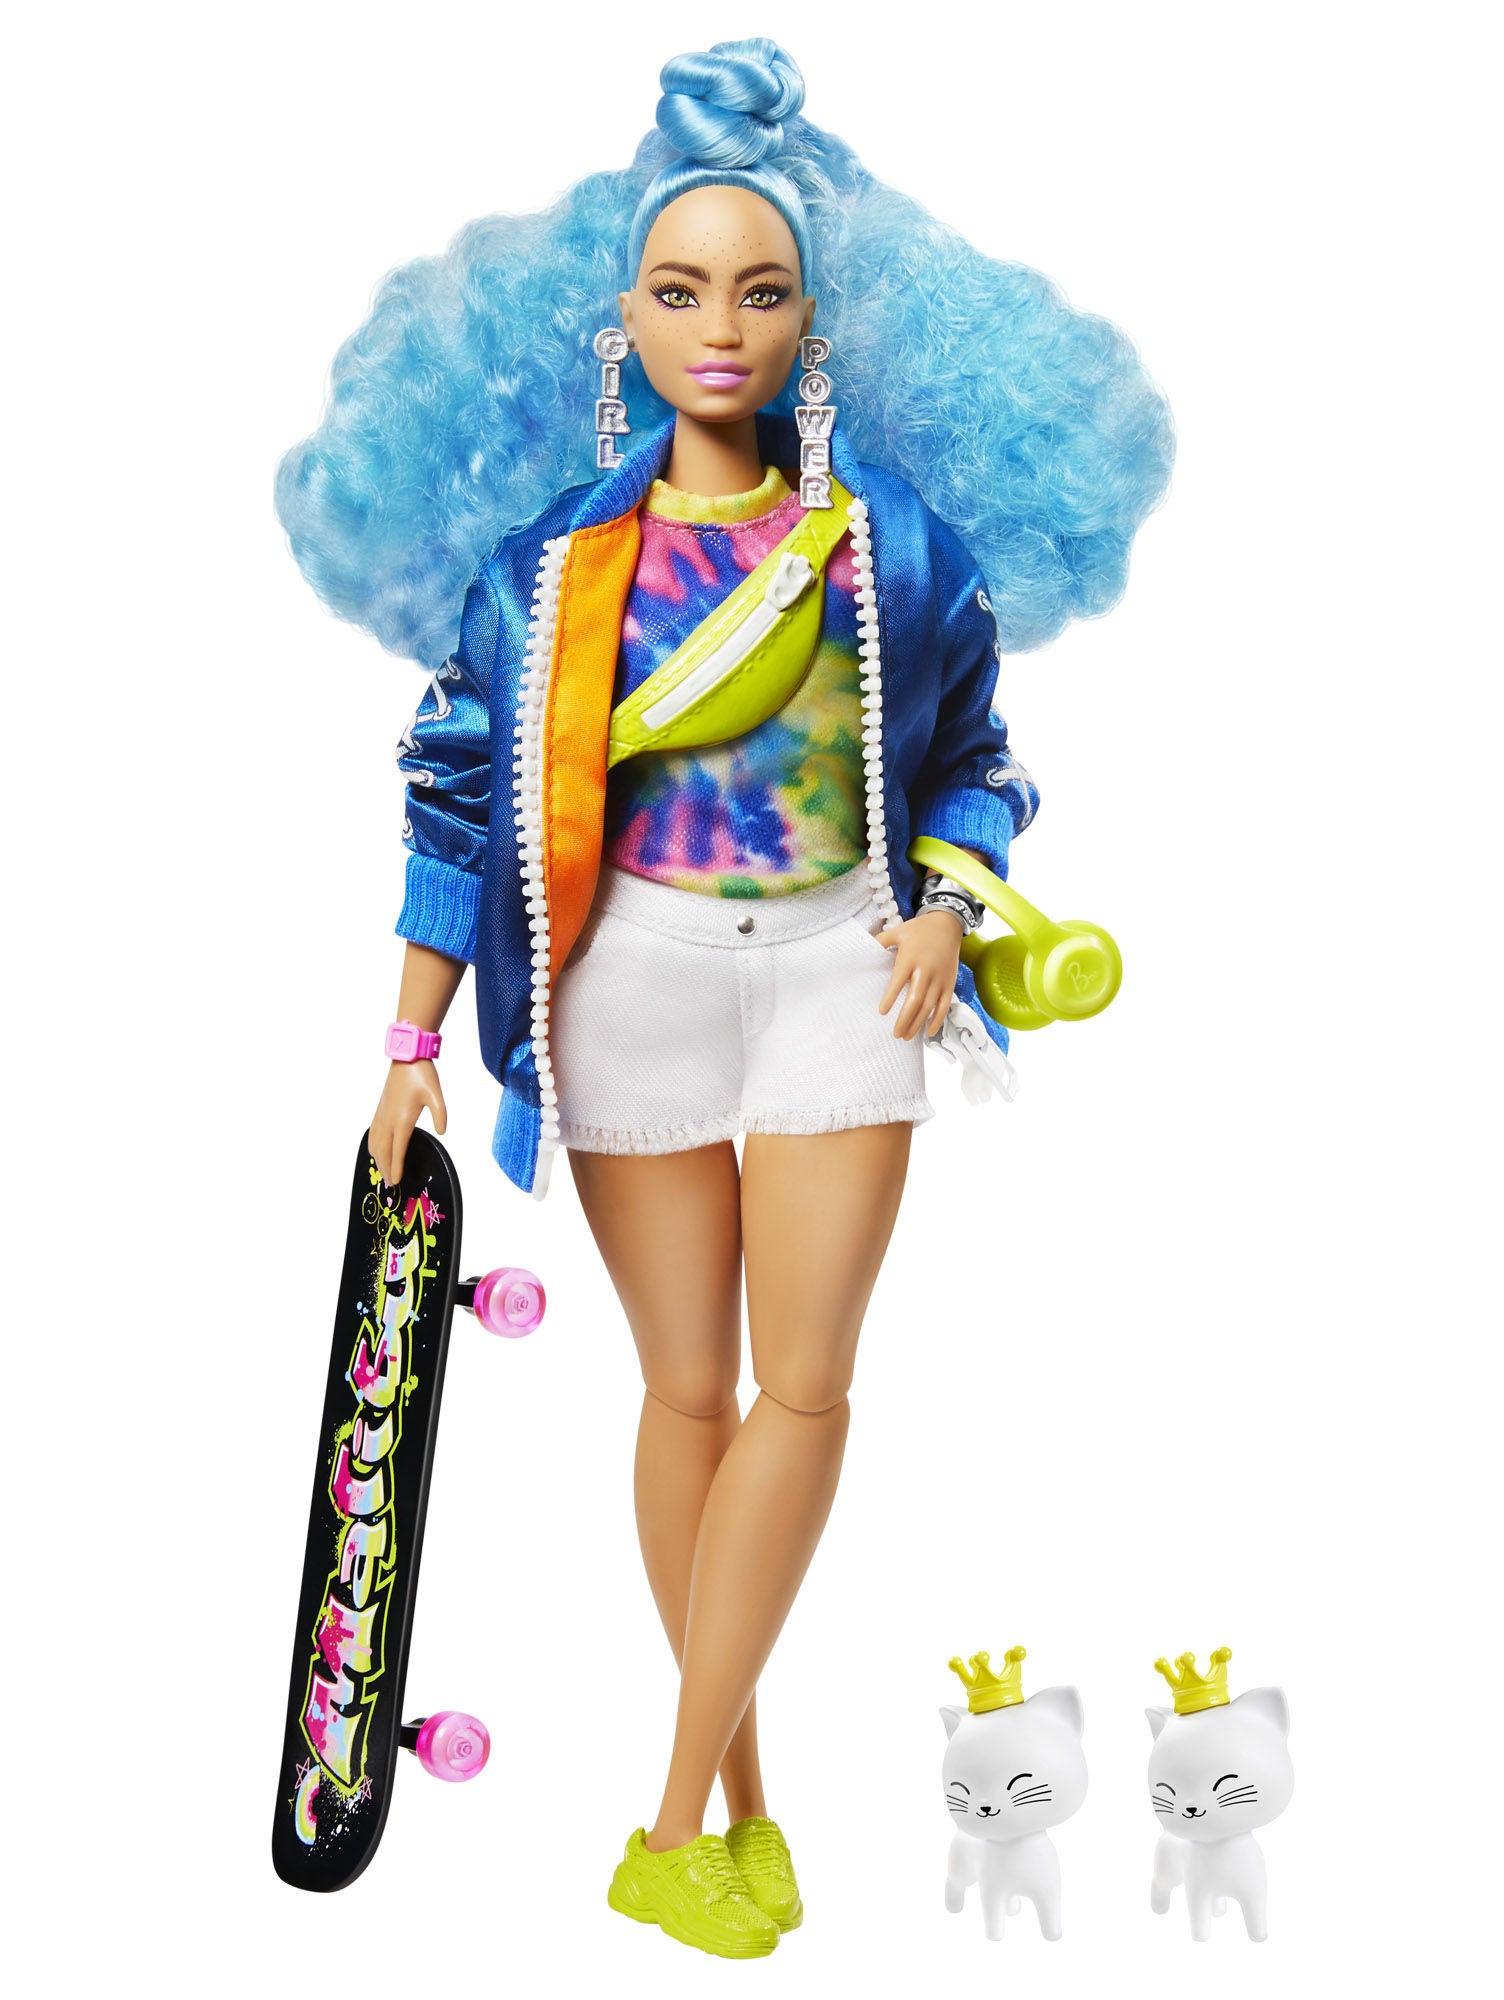 Barbie Extra Doll Blue Curly Hair Docka